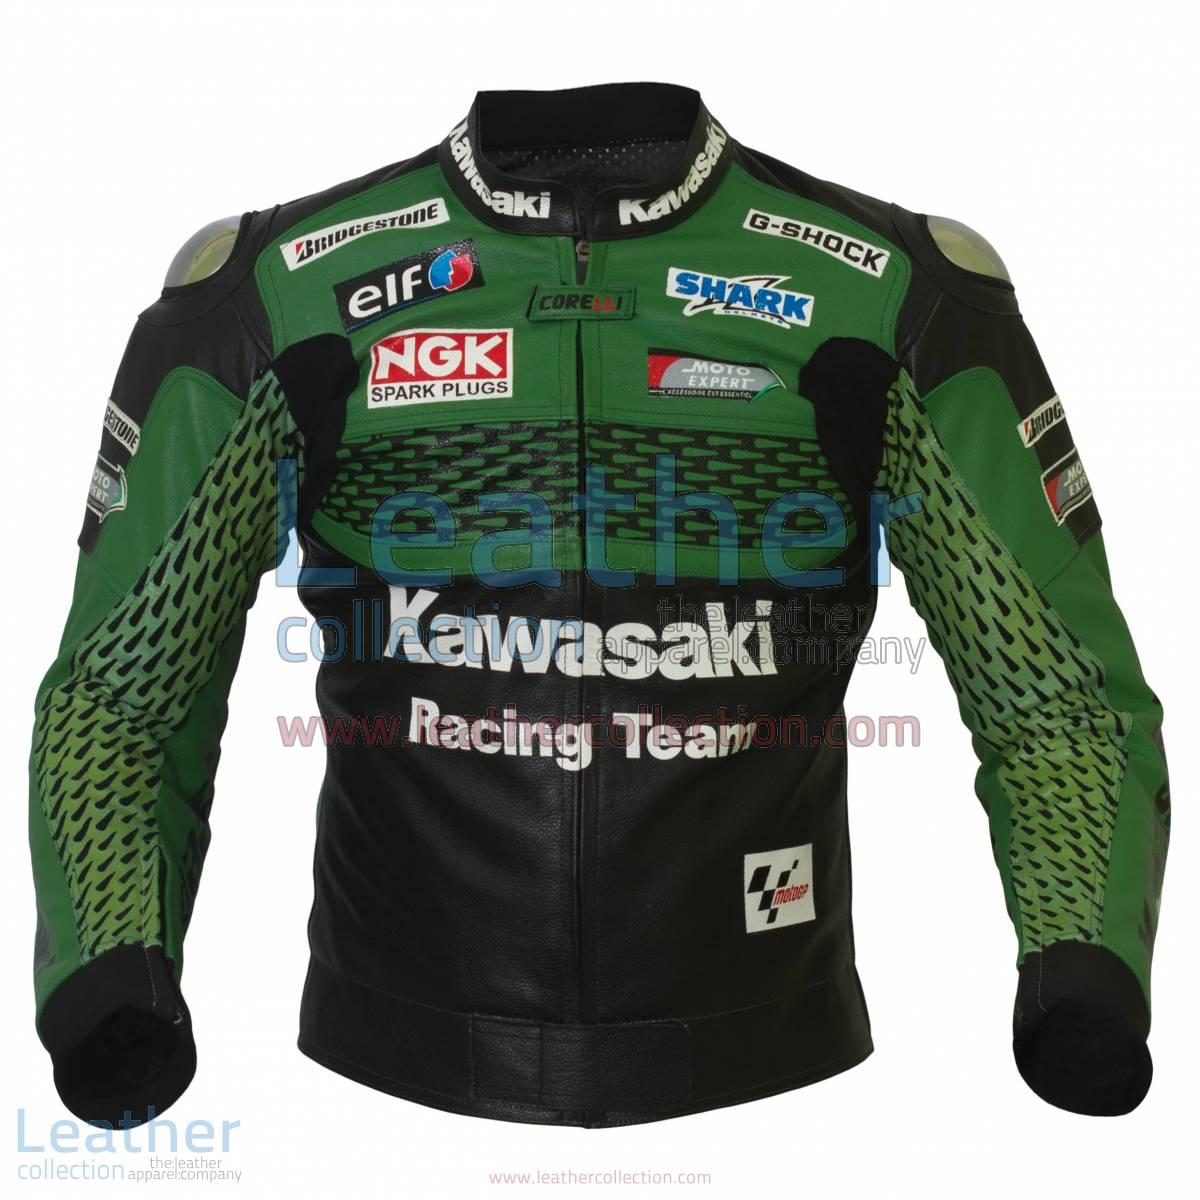 Kawasaki Racing Team Leather Jacket | team leather jacket,kawasaki racing jacket